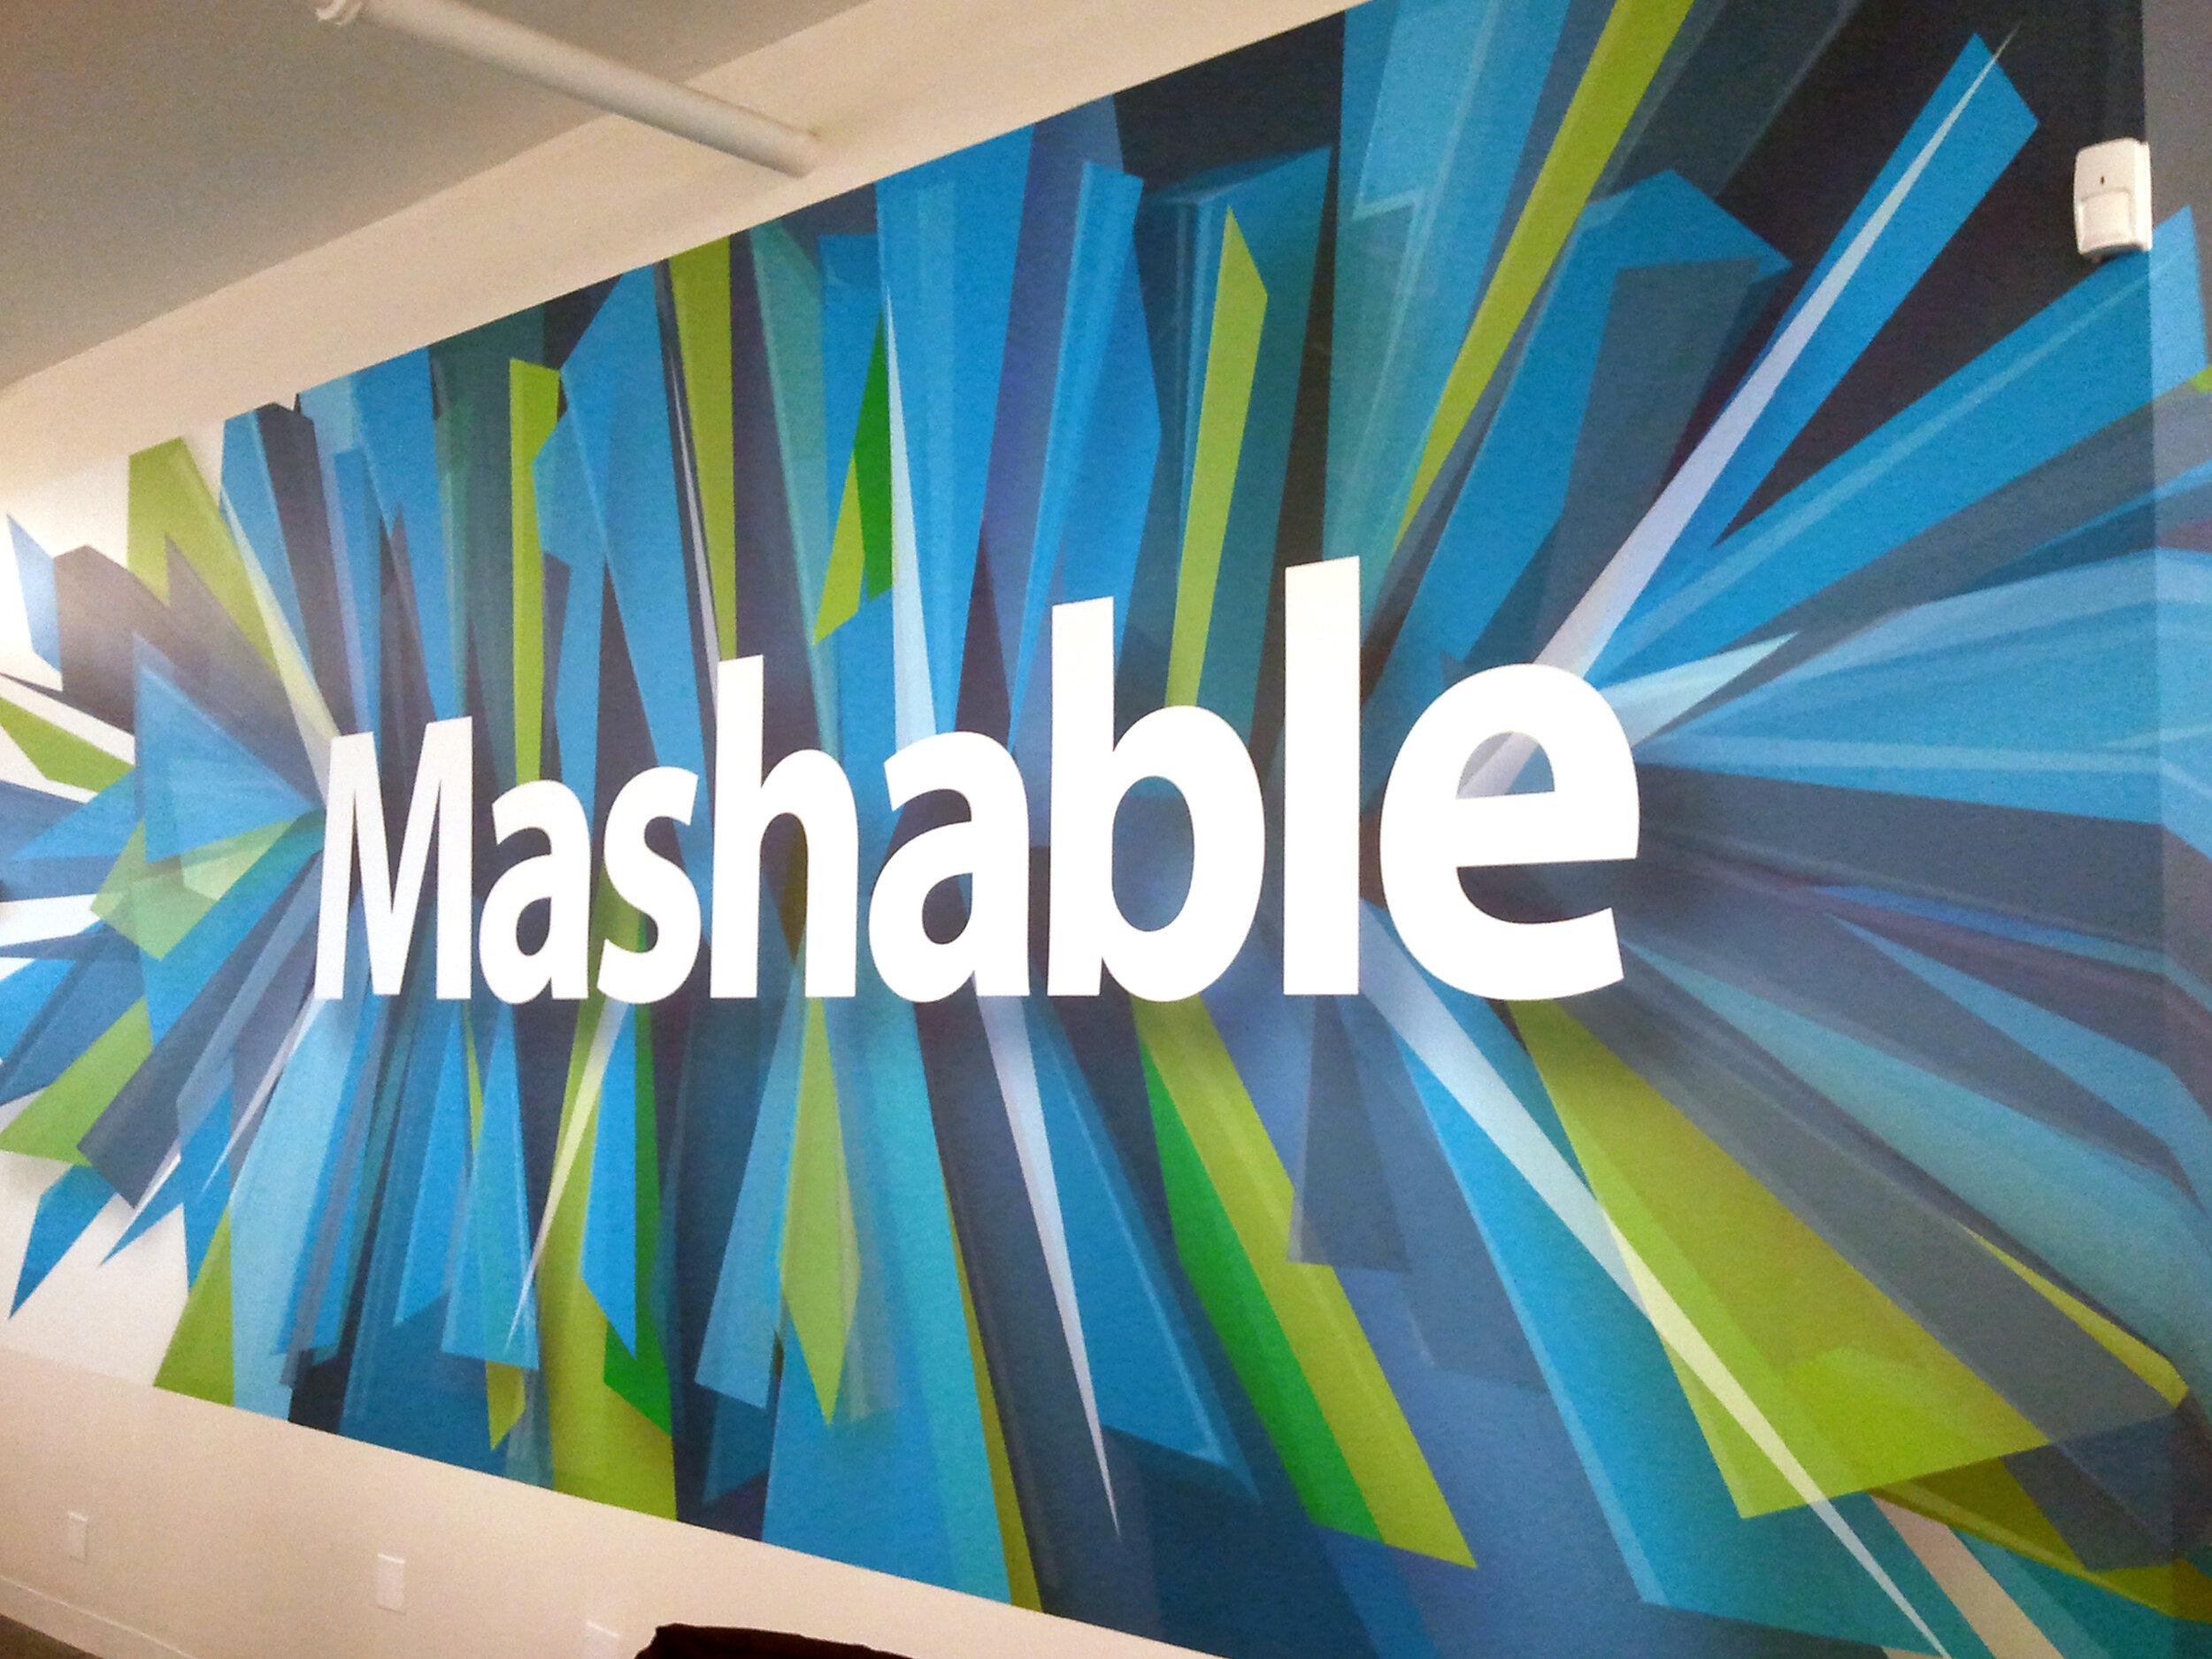 mashable-location.jpg